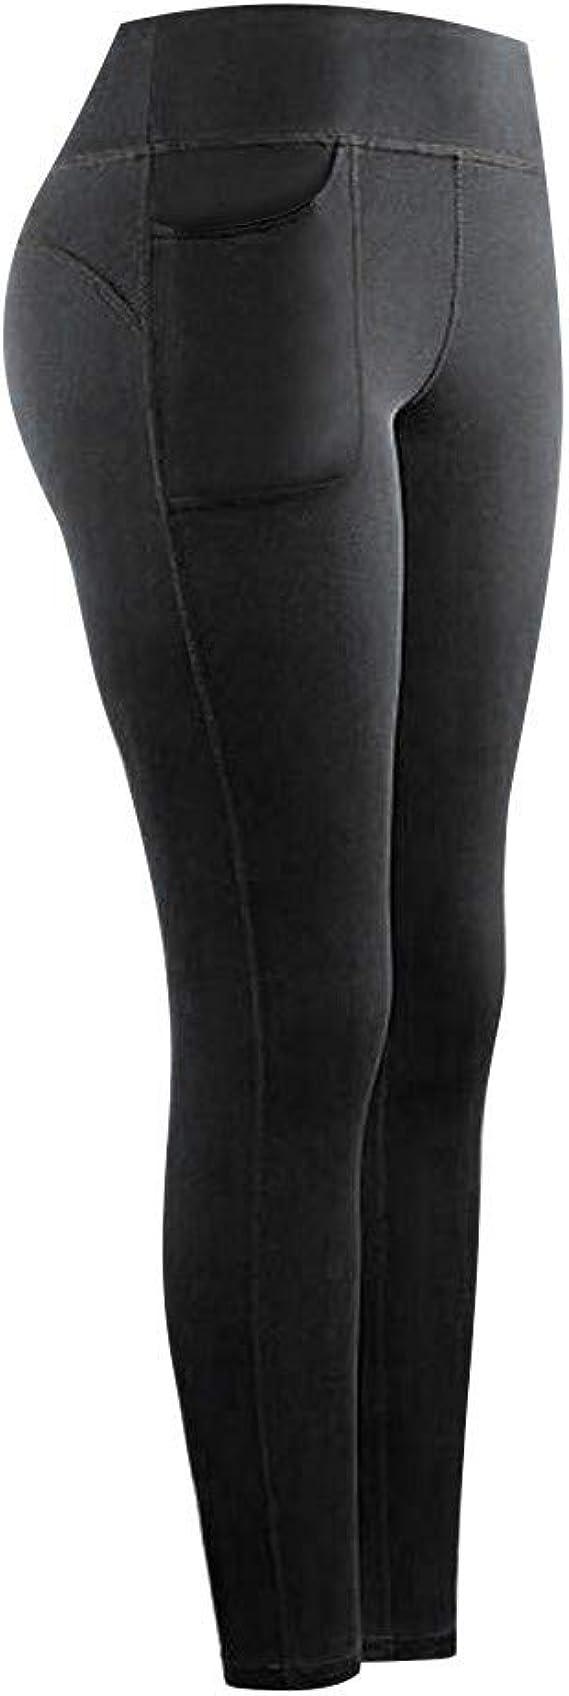 Amazon.com: Xinantime Womens Stretch Yoga Leggings Fitness ...